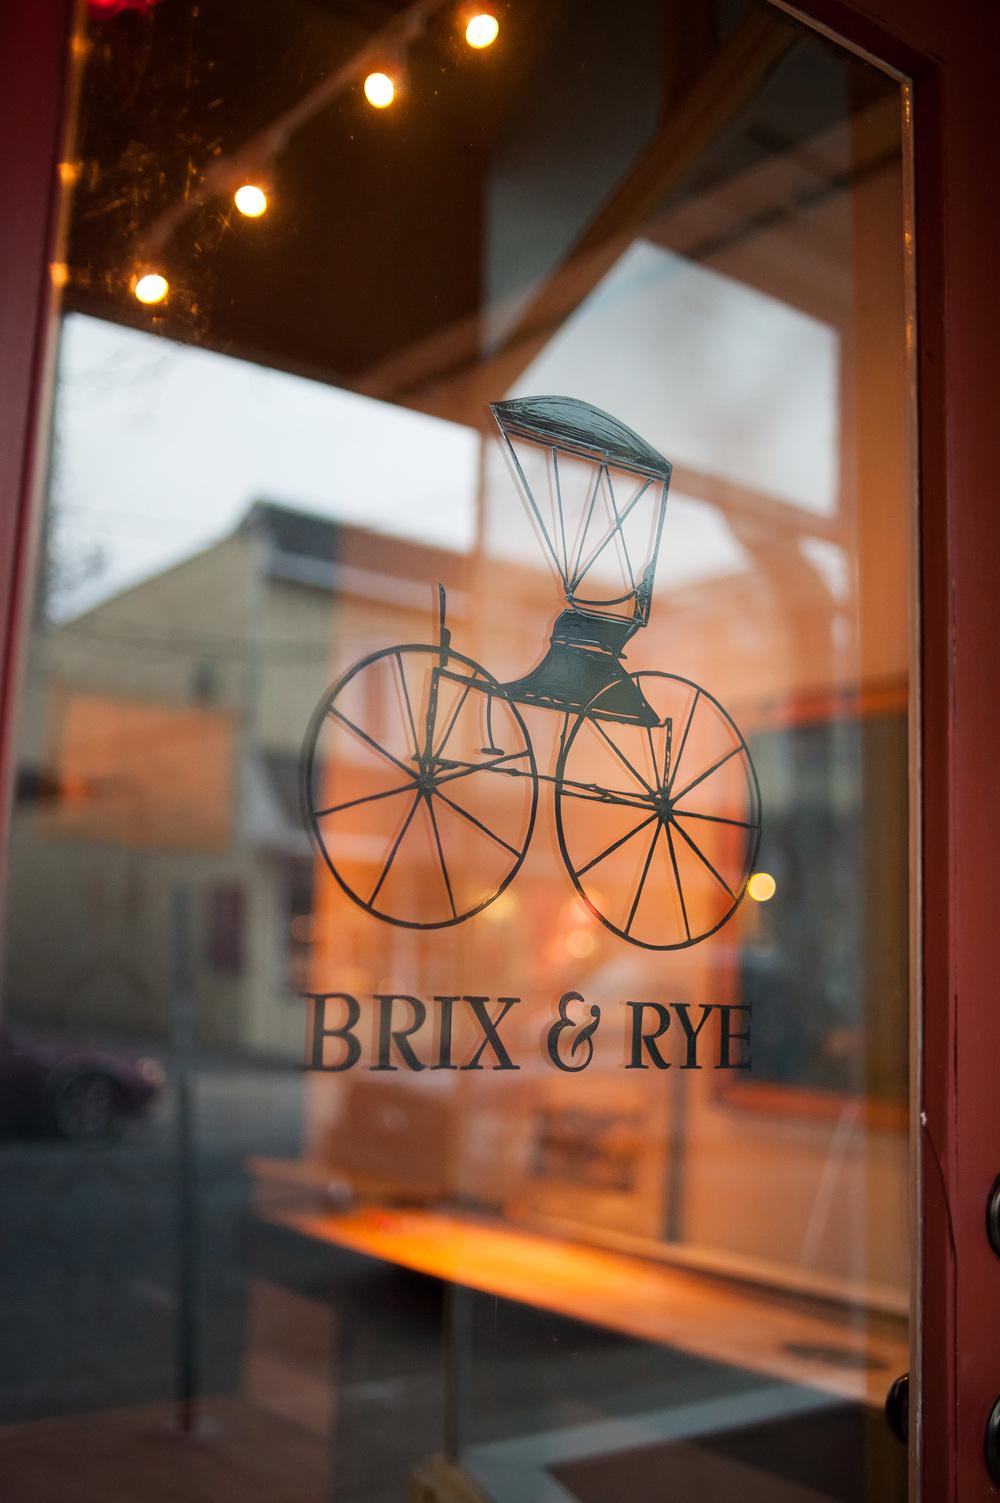 Brix and Rye